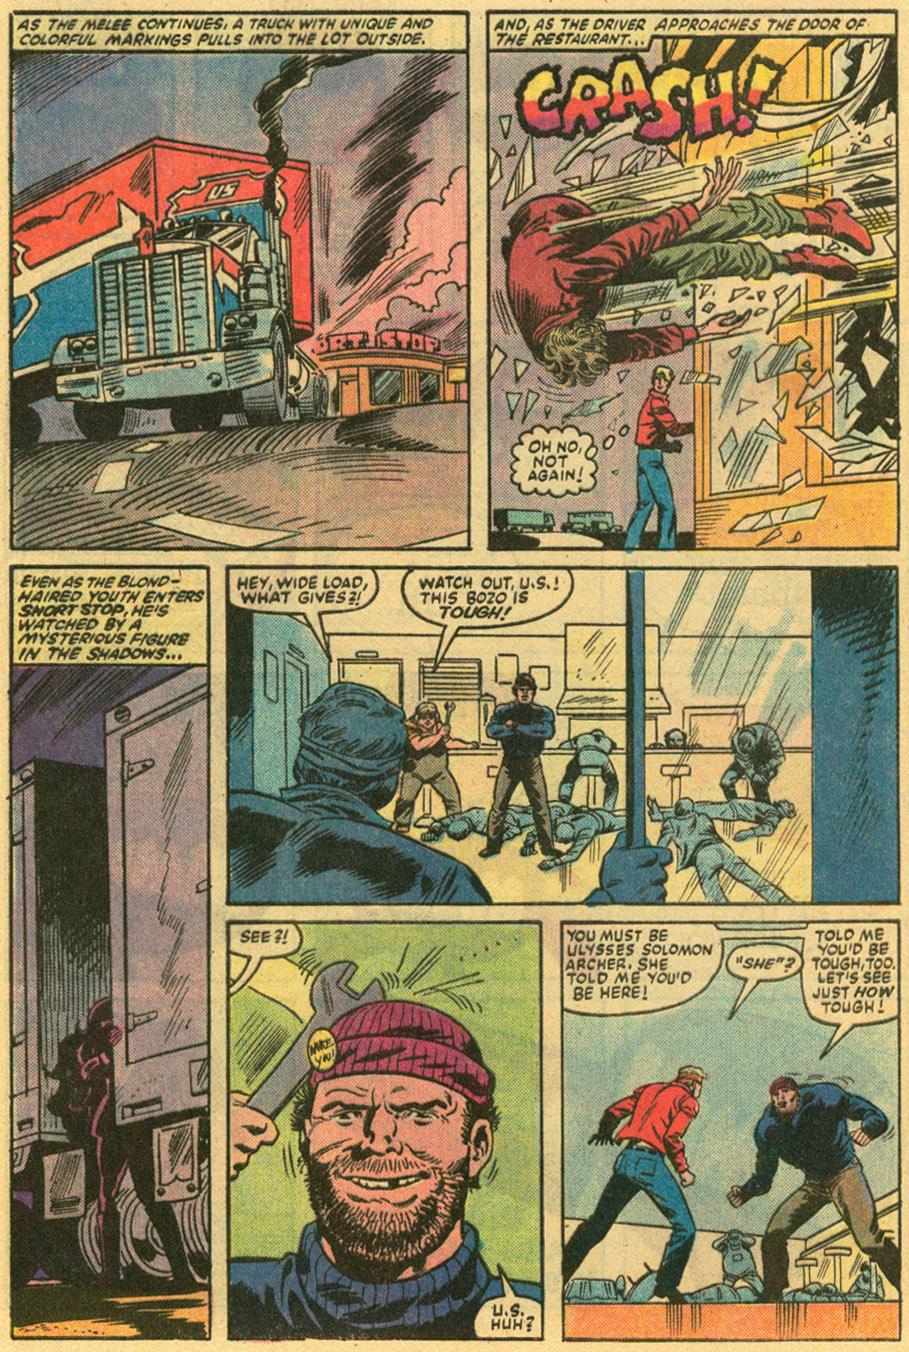 Read online U.S. 1 comic -  Issue #2 - 4